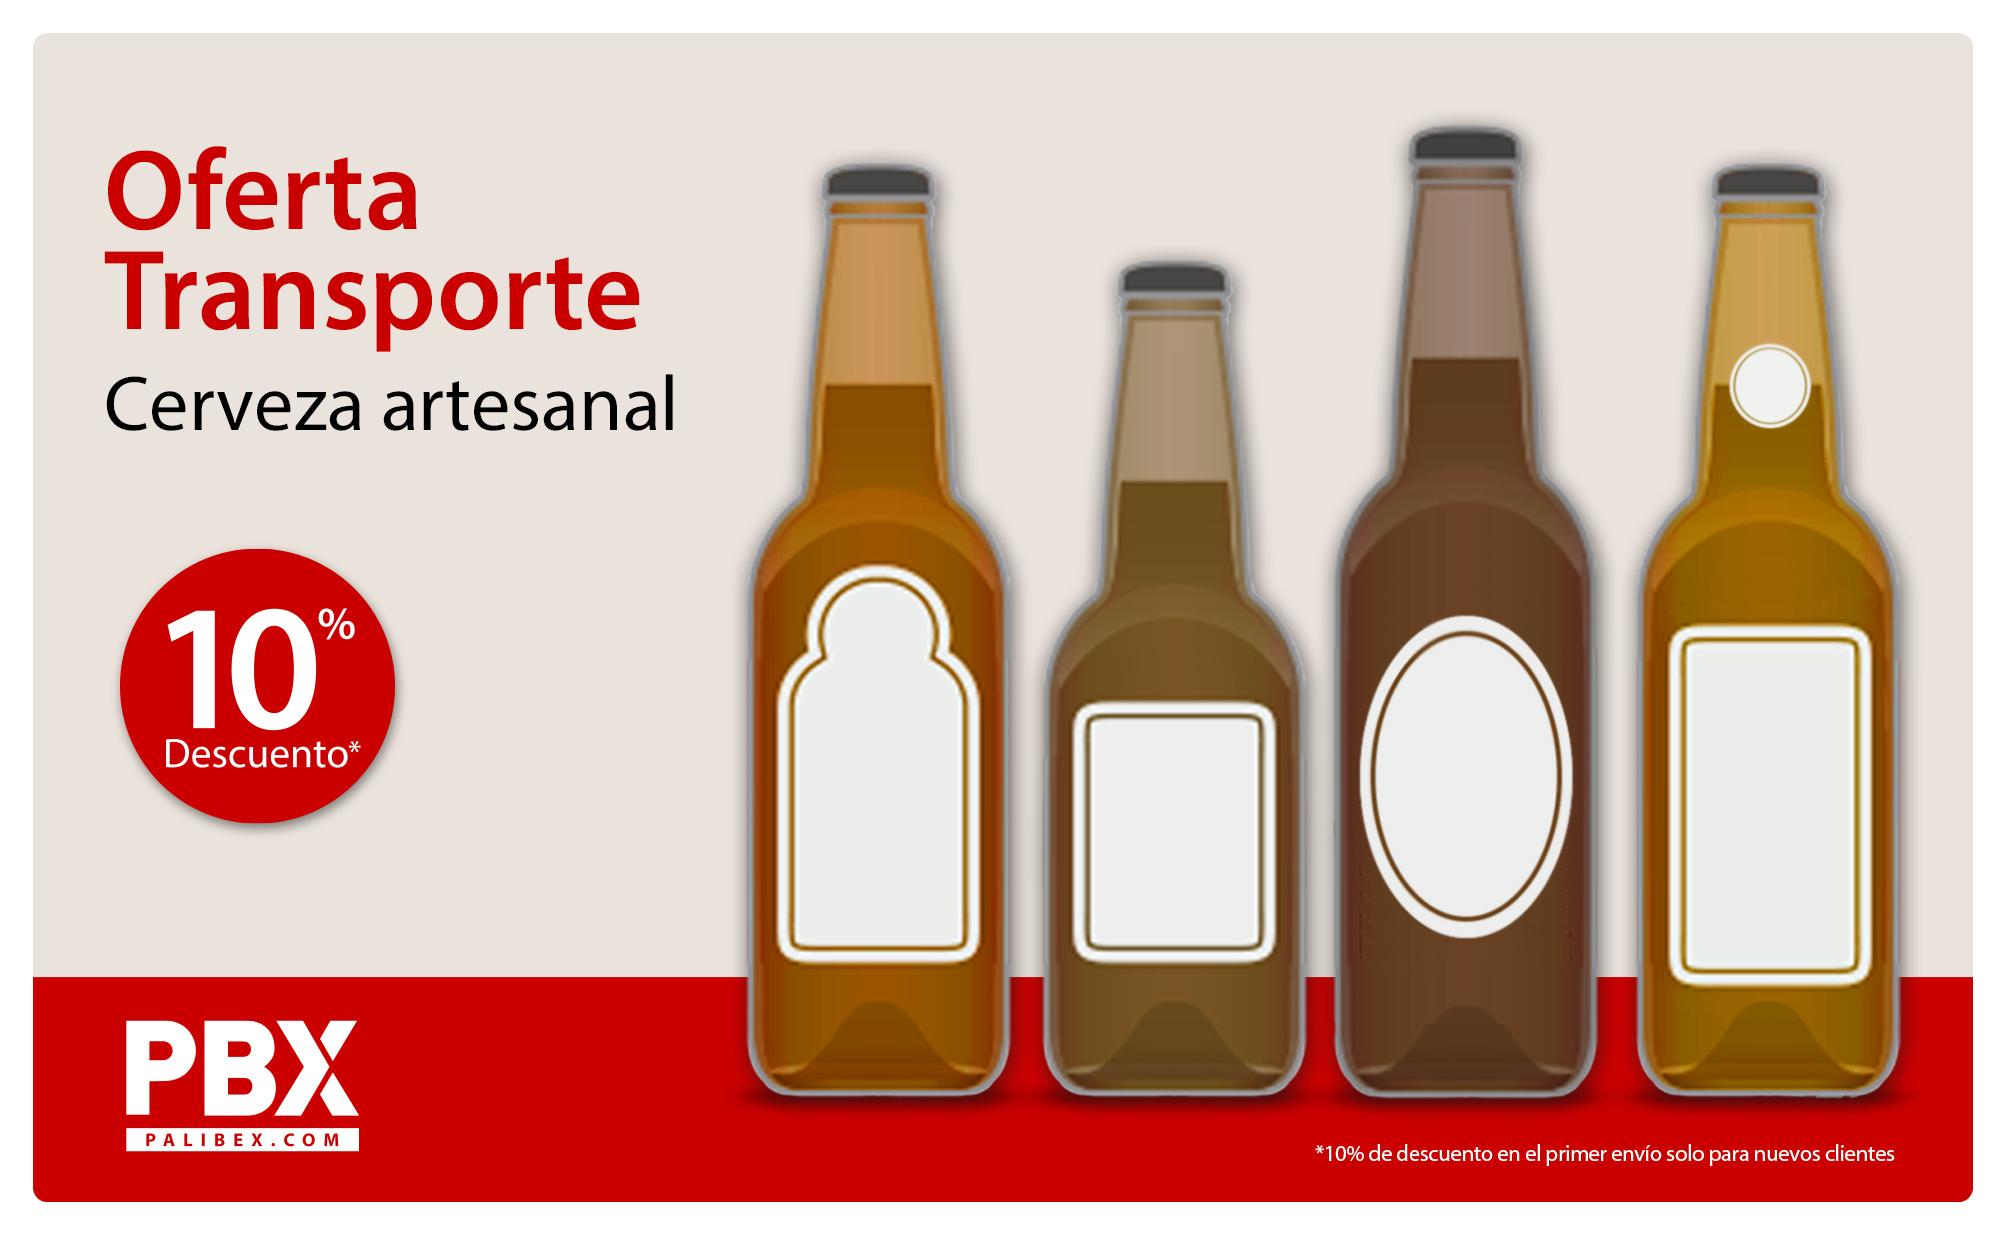 palibex - oferta transporte cerveza artesanal - oferta transporte cerveza a